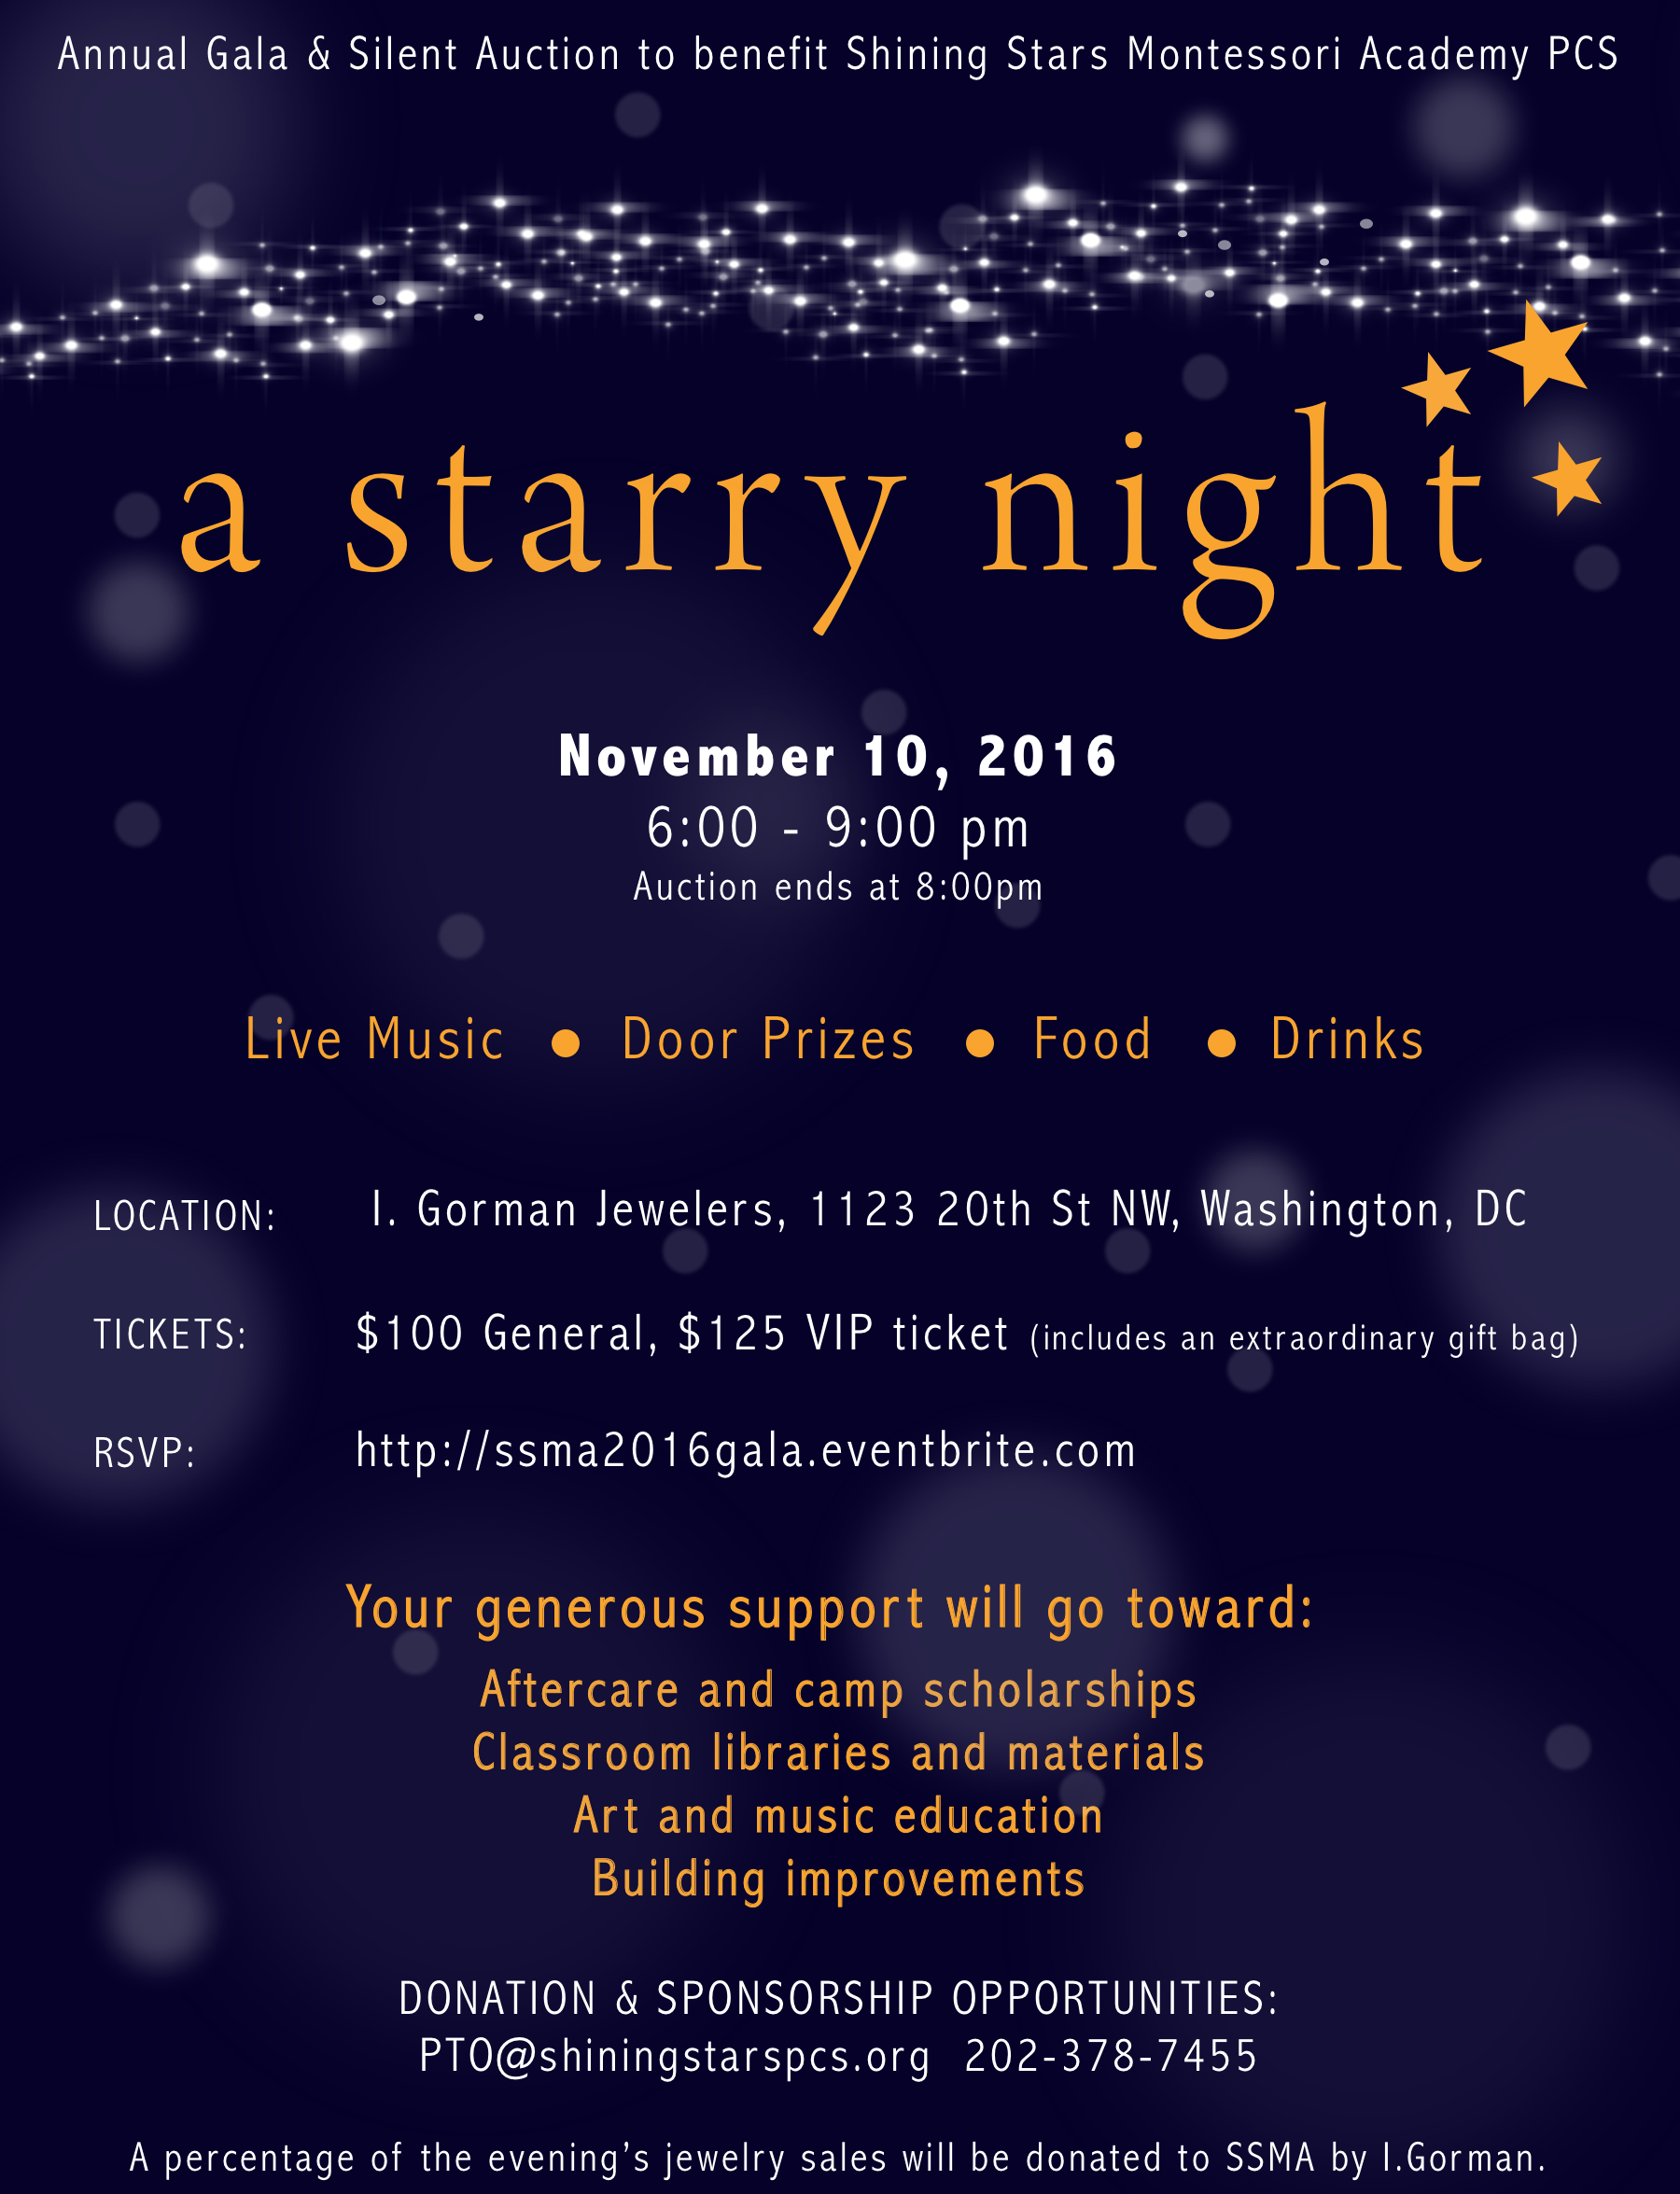 a starry night postcardv4.png